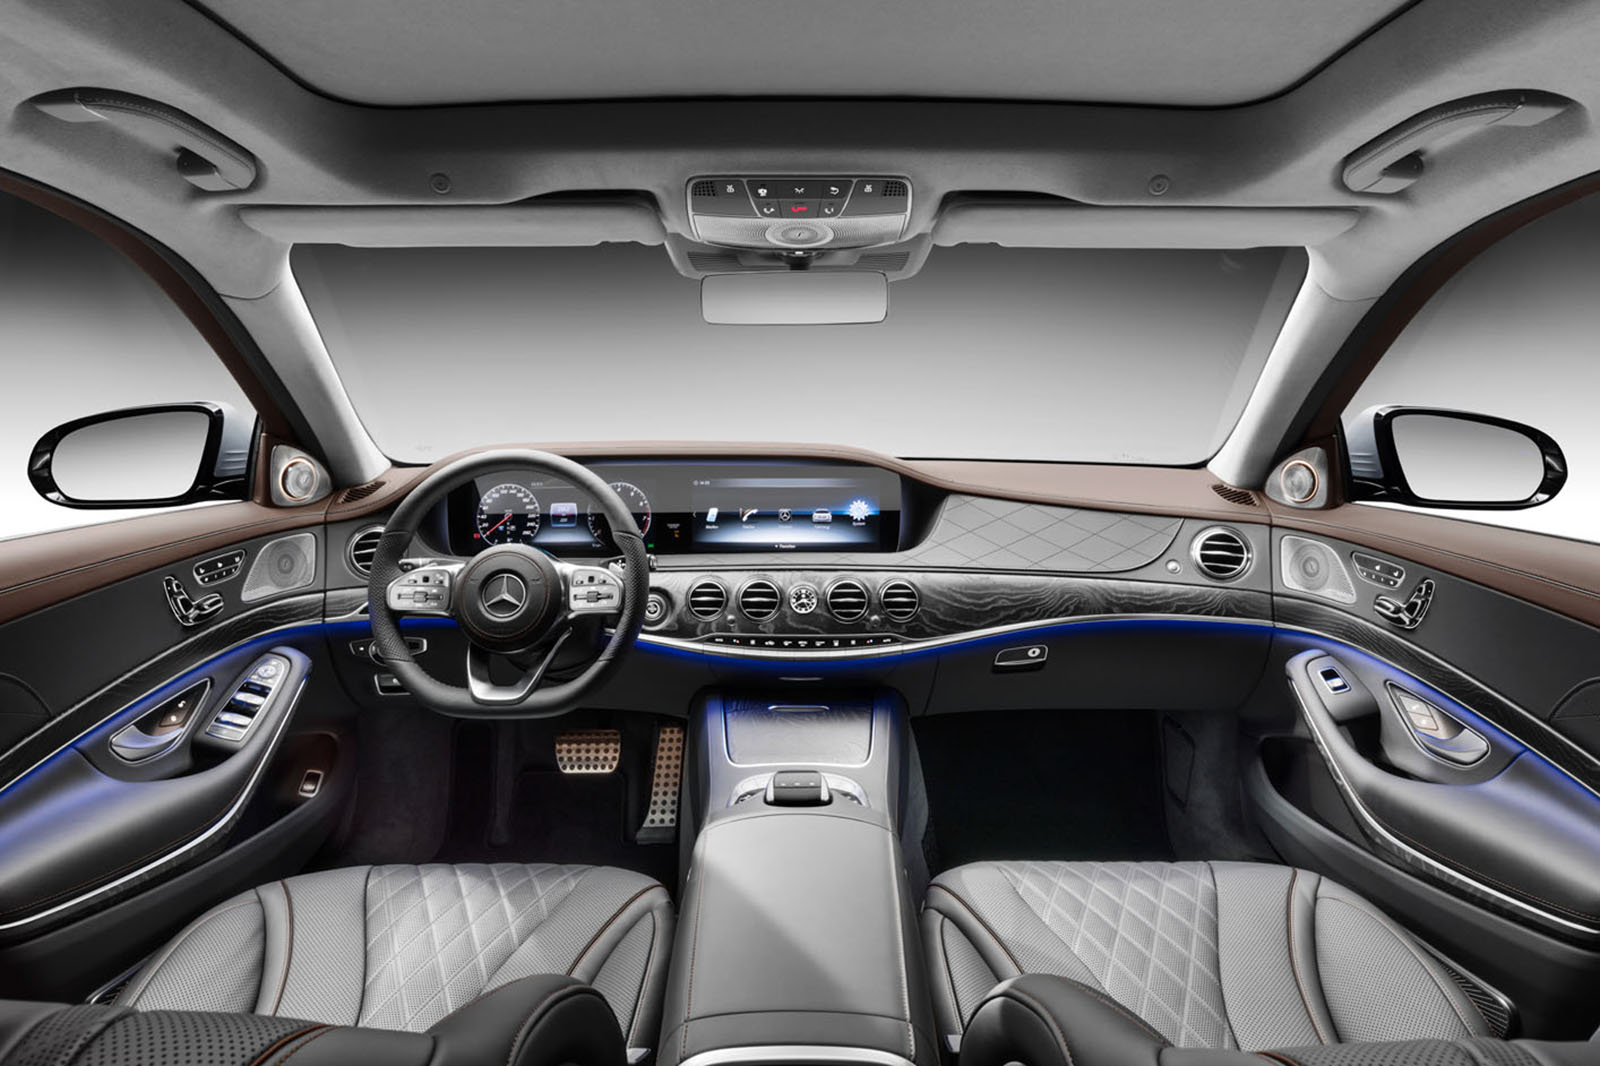 mercedes owners to drive hands free with autonomous tech by 2020 rh autocar co uk mercedes s class w221 user manual mercedes benz s class owners manual